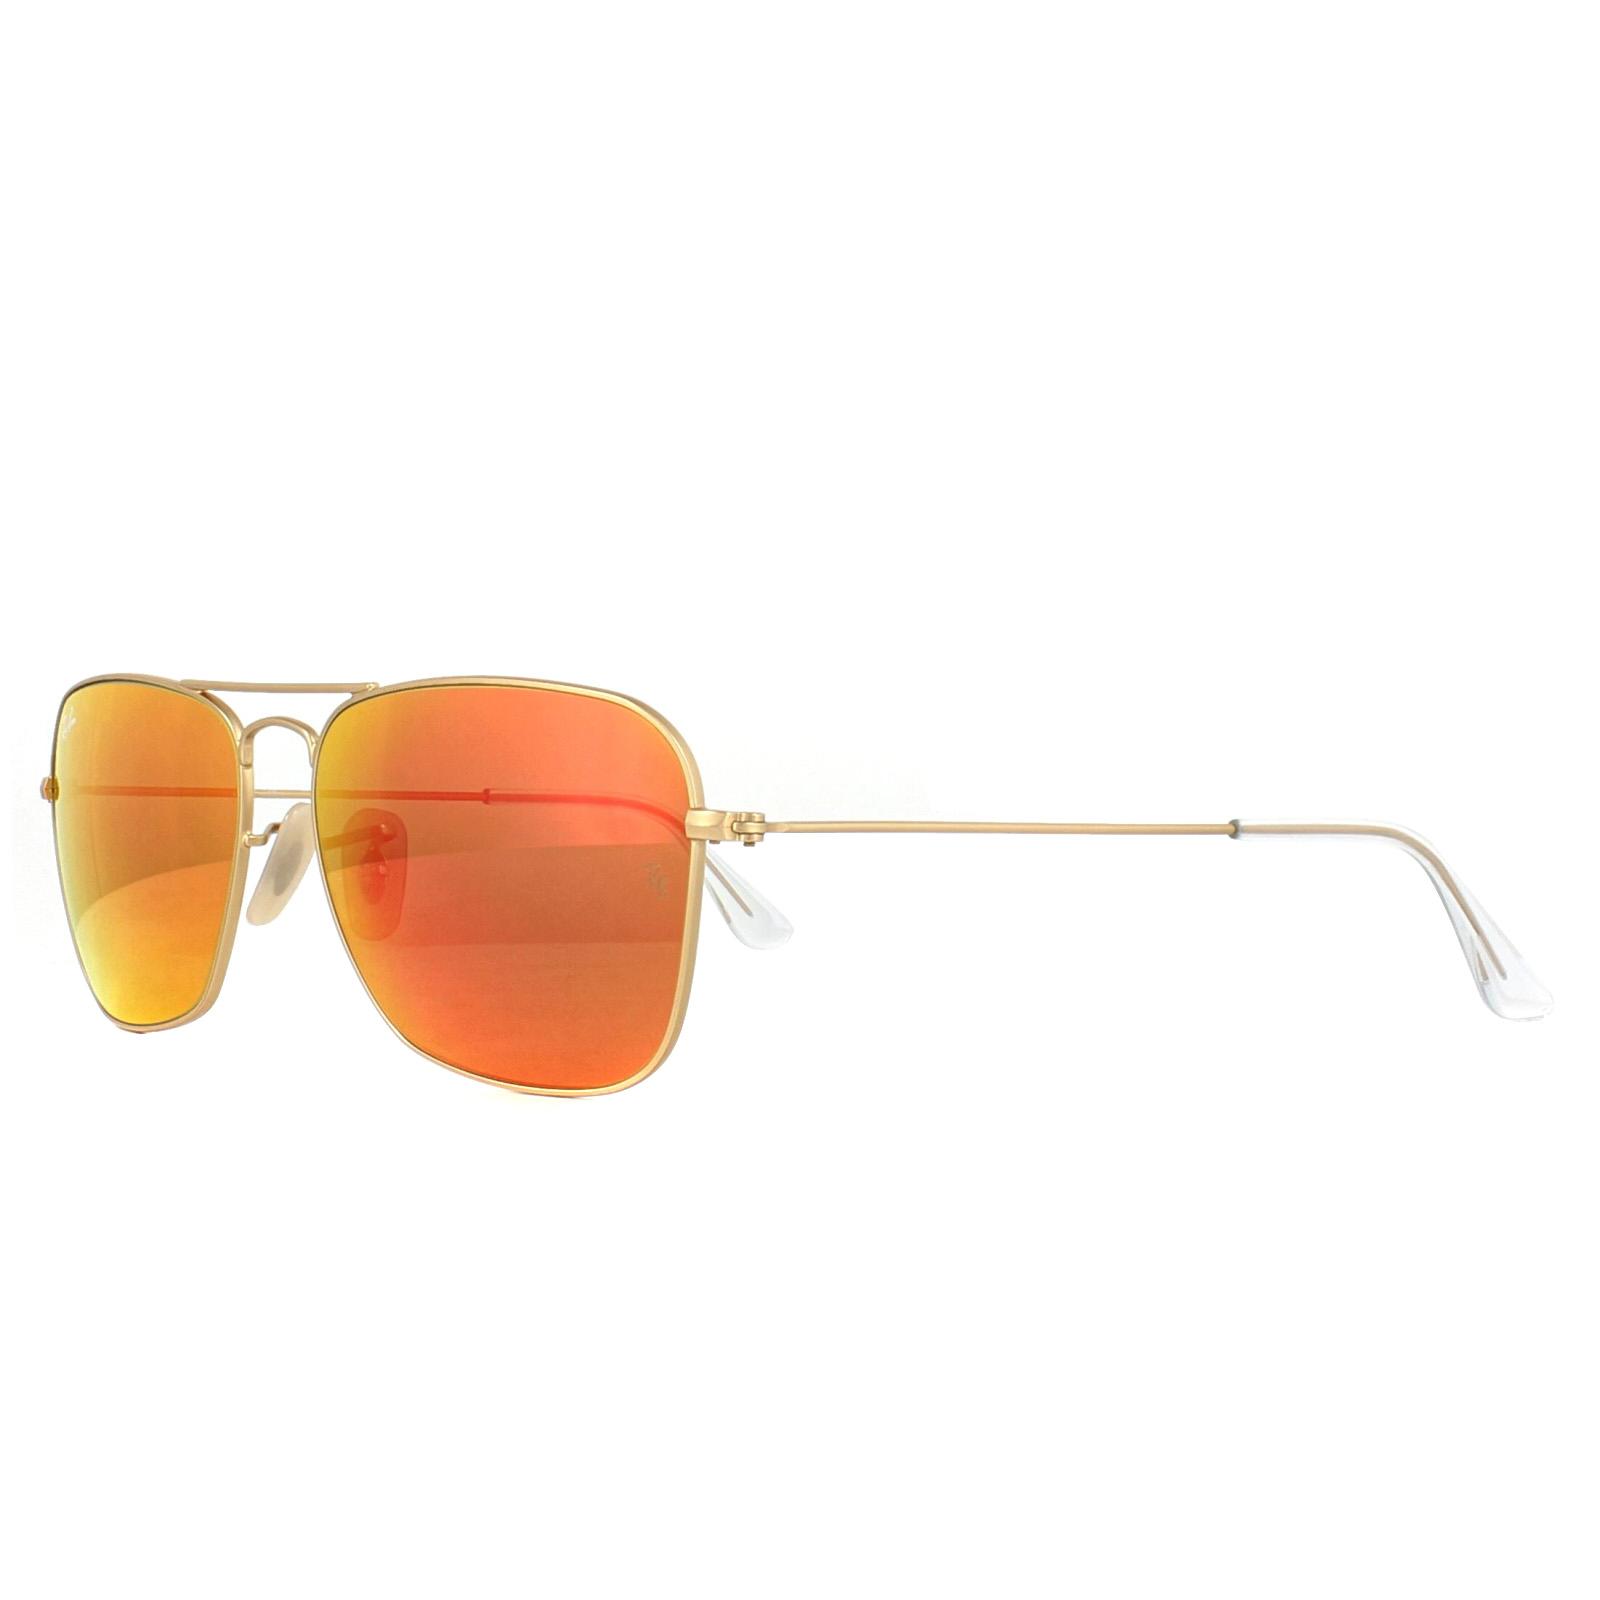 10530198af Sentinel Ray-Ban Sunglasses Caravan 3136 112 69 Gold Orange Mirror 58mm